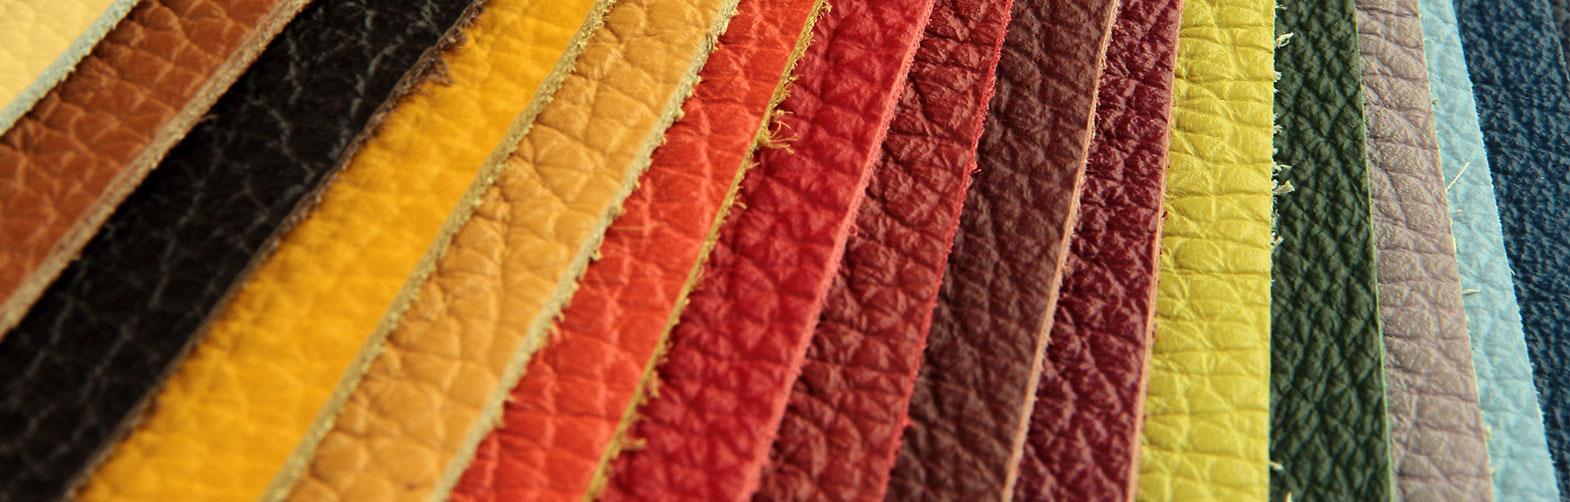 textiel-leder2_1_1.jpg